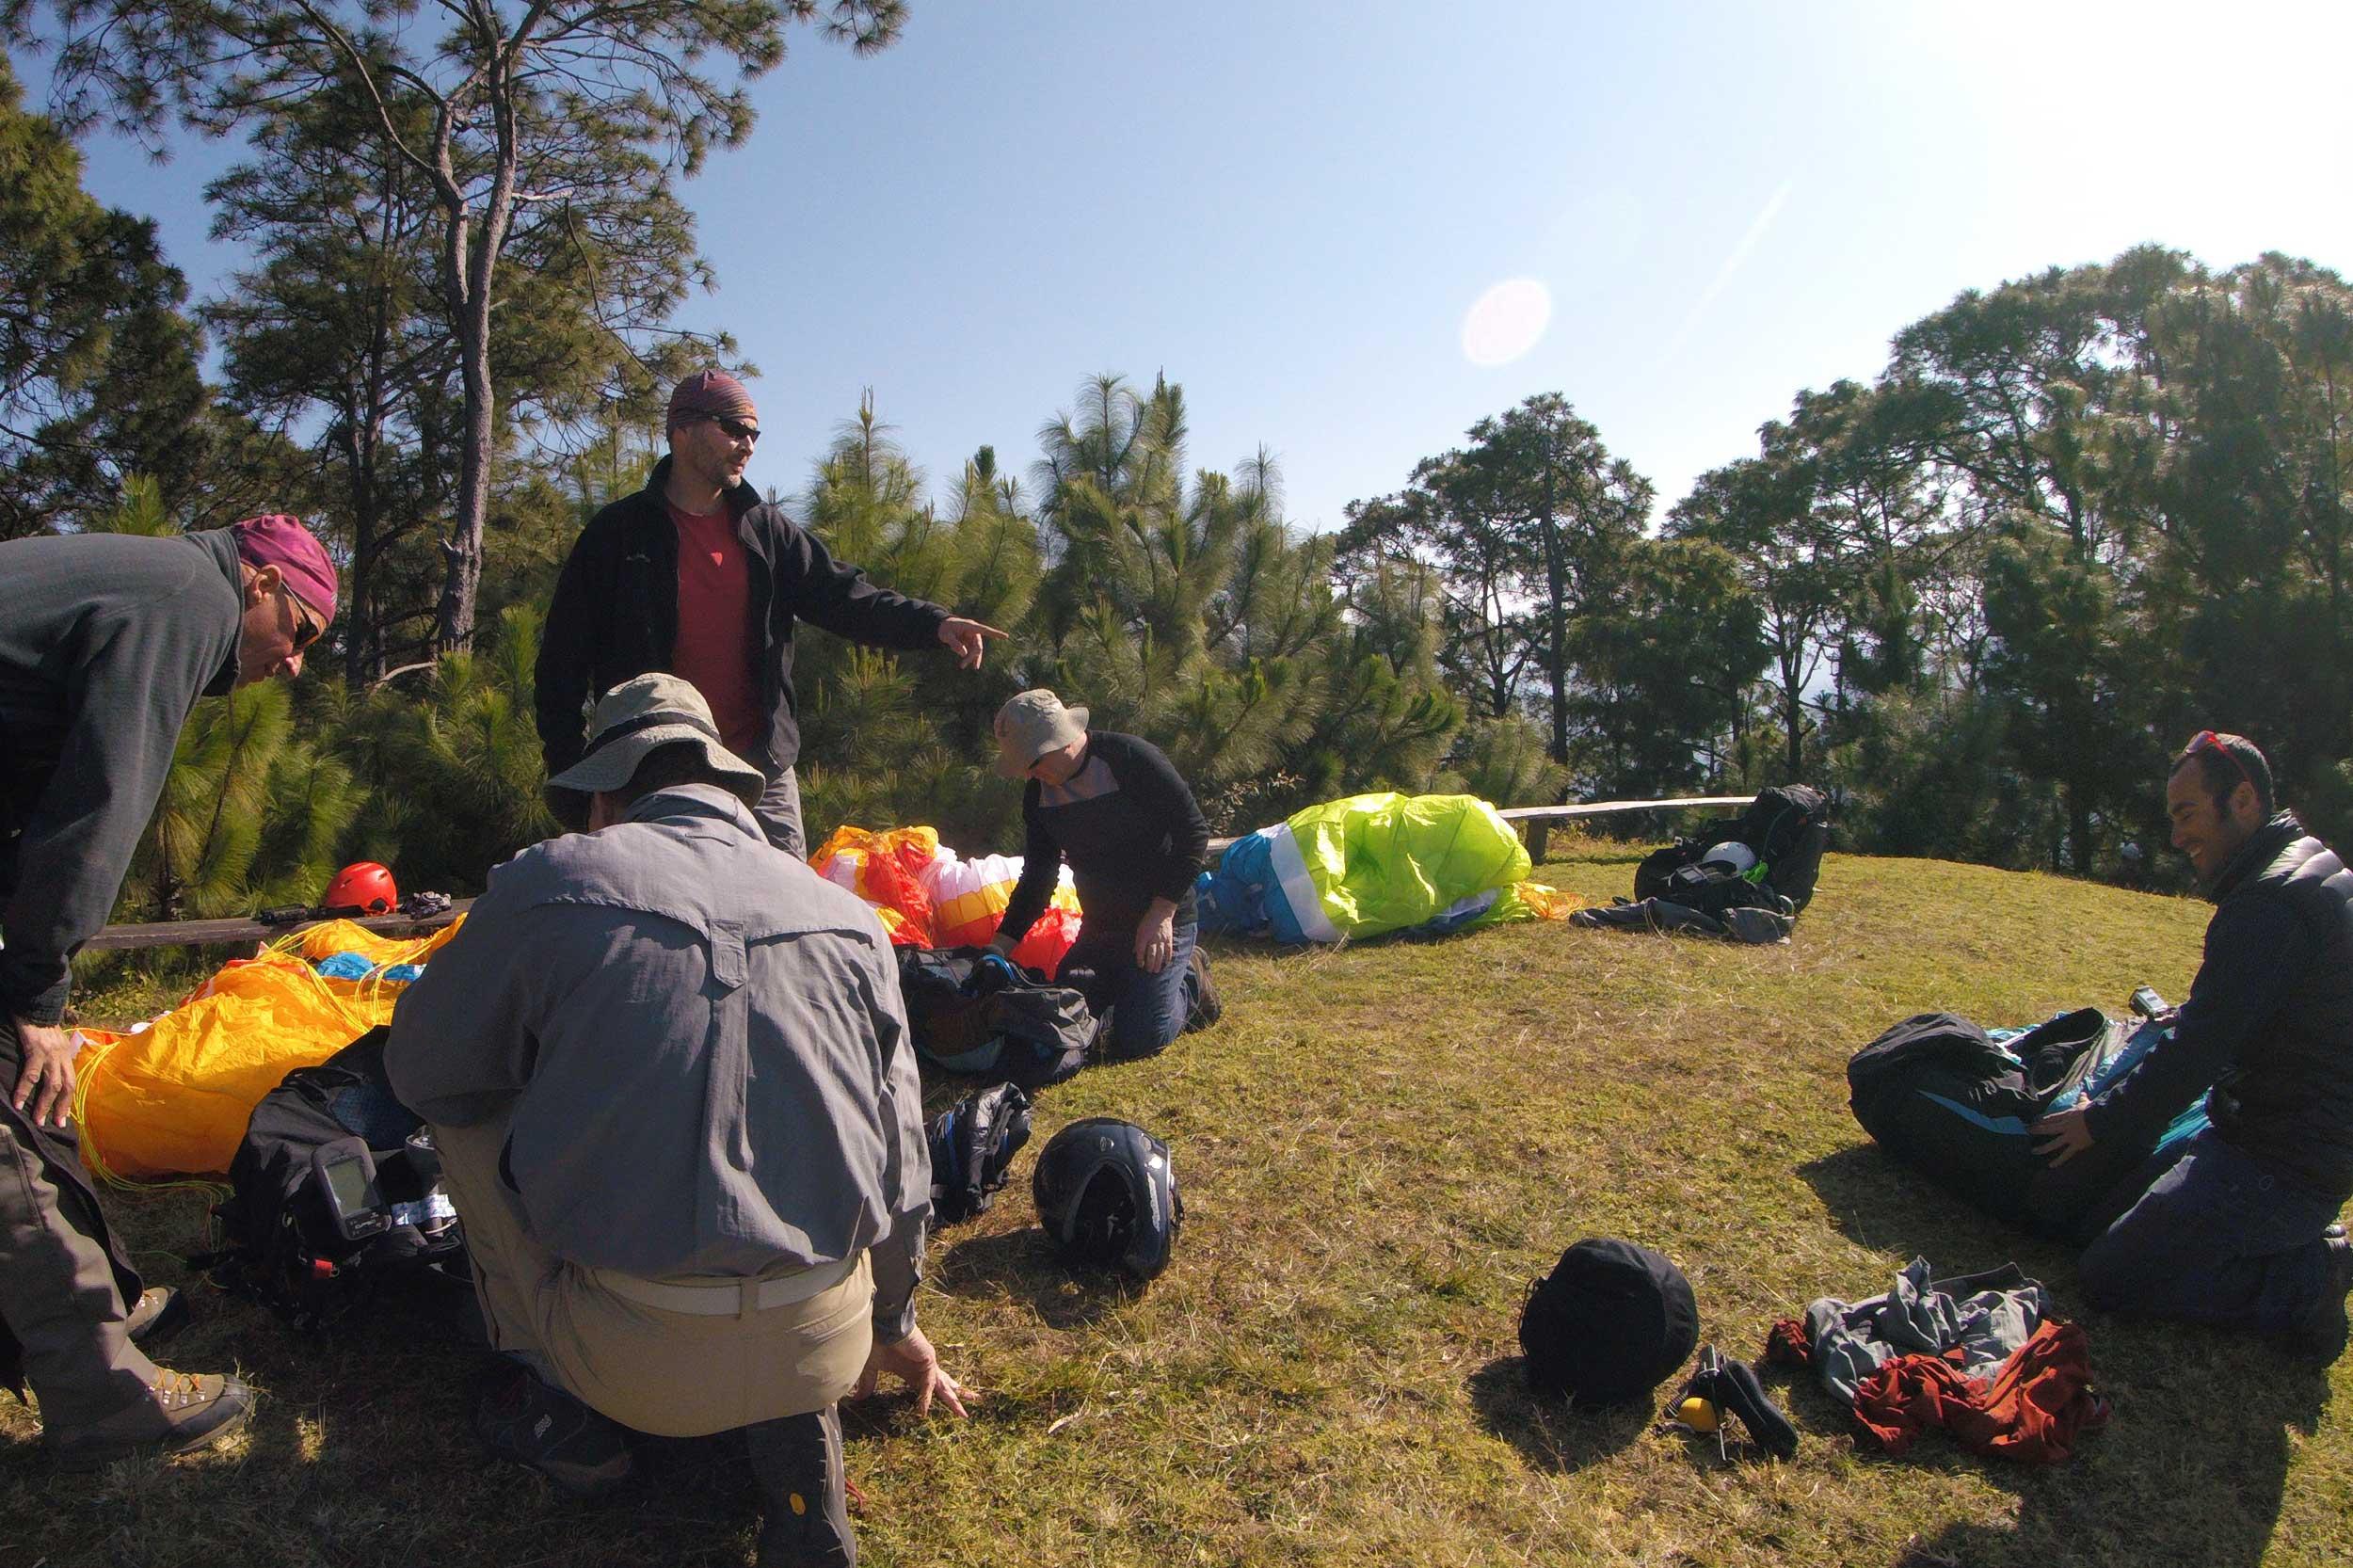 Paraglide-New-England-Trips-Valle-de-Bravo-Mexico-Gallery-Team-Gear-Check.jpg